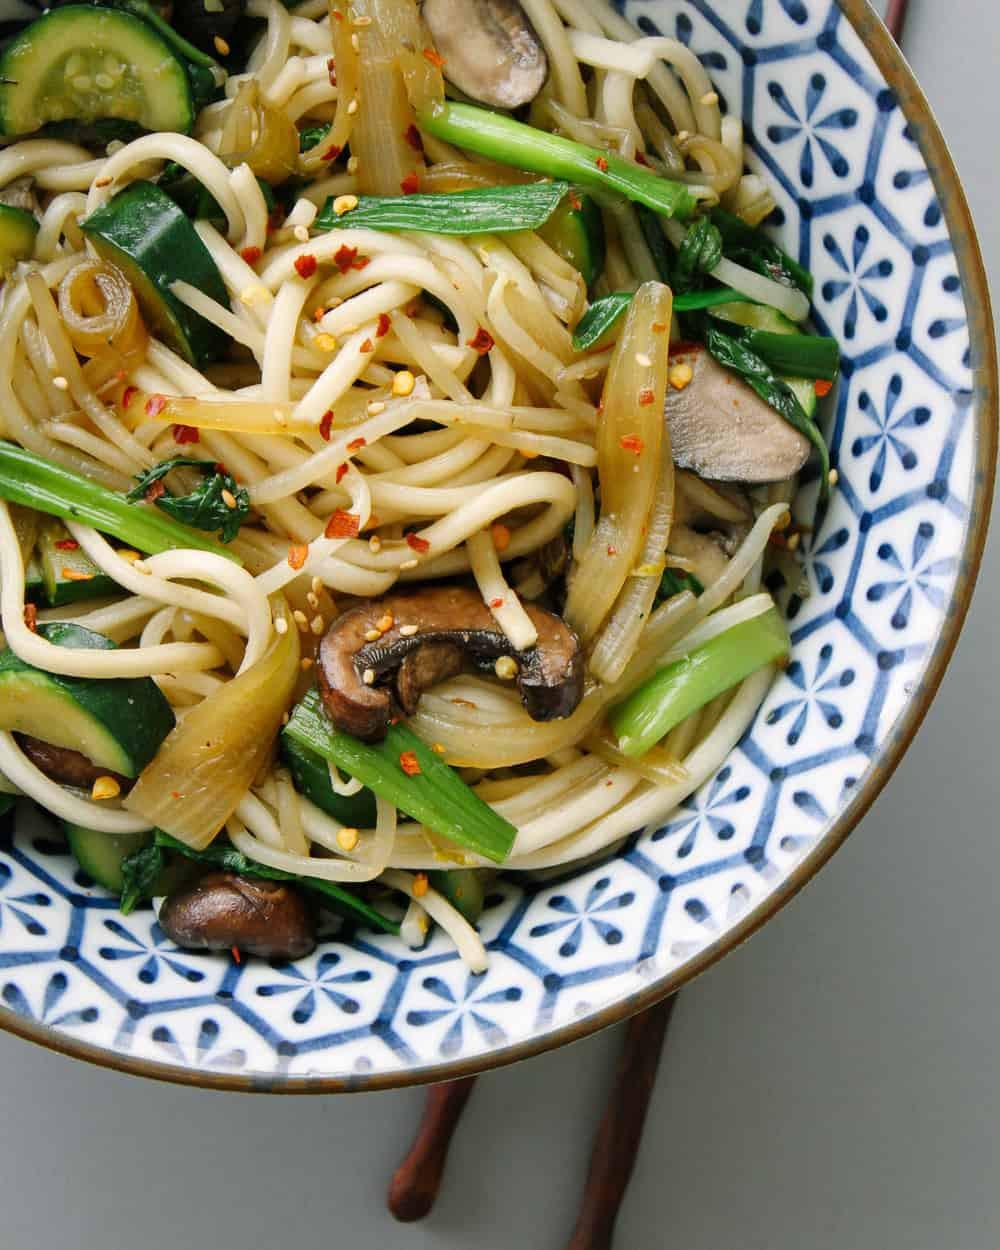 Udon Noodles Healthy  SIMPLE UDON NOODLE BOWL THE SIMPLE VEGANISTA